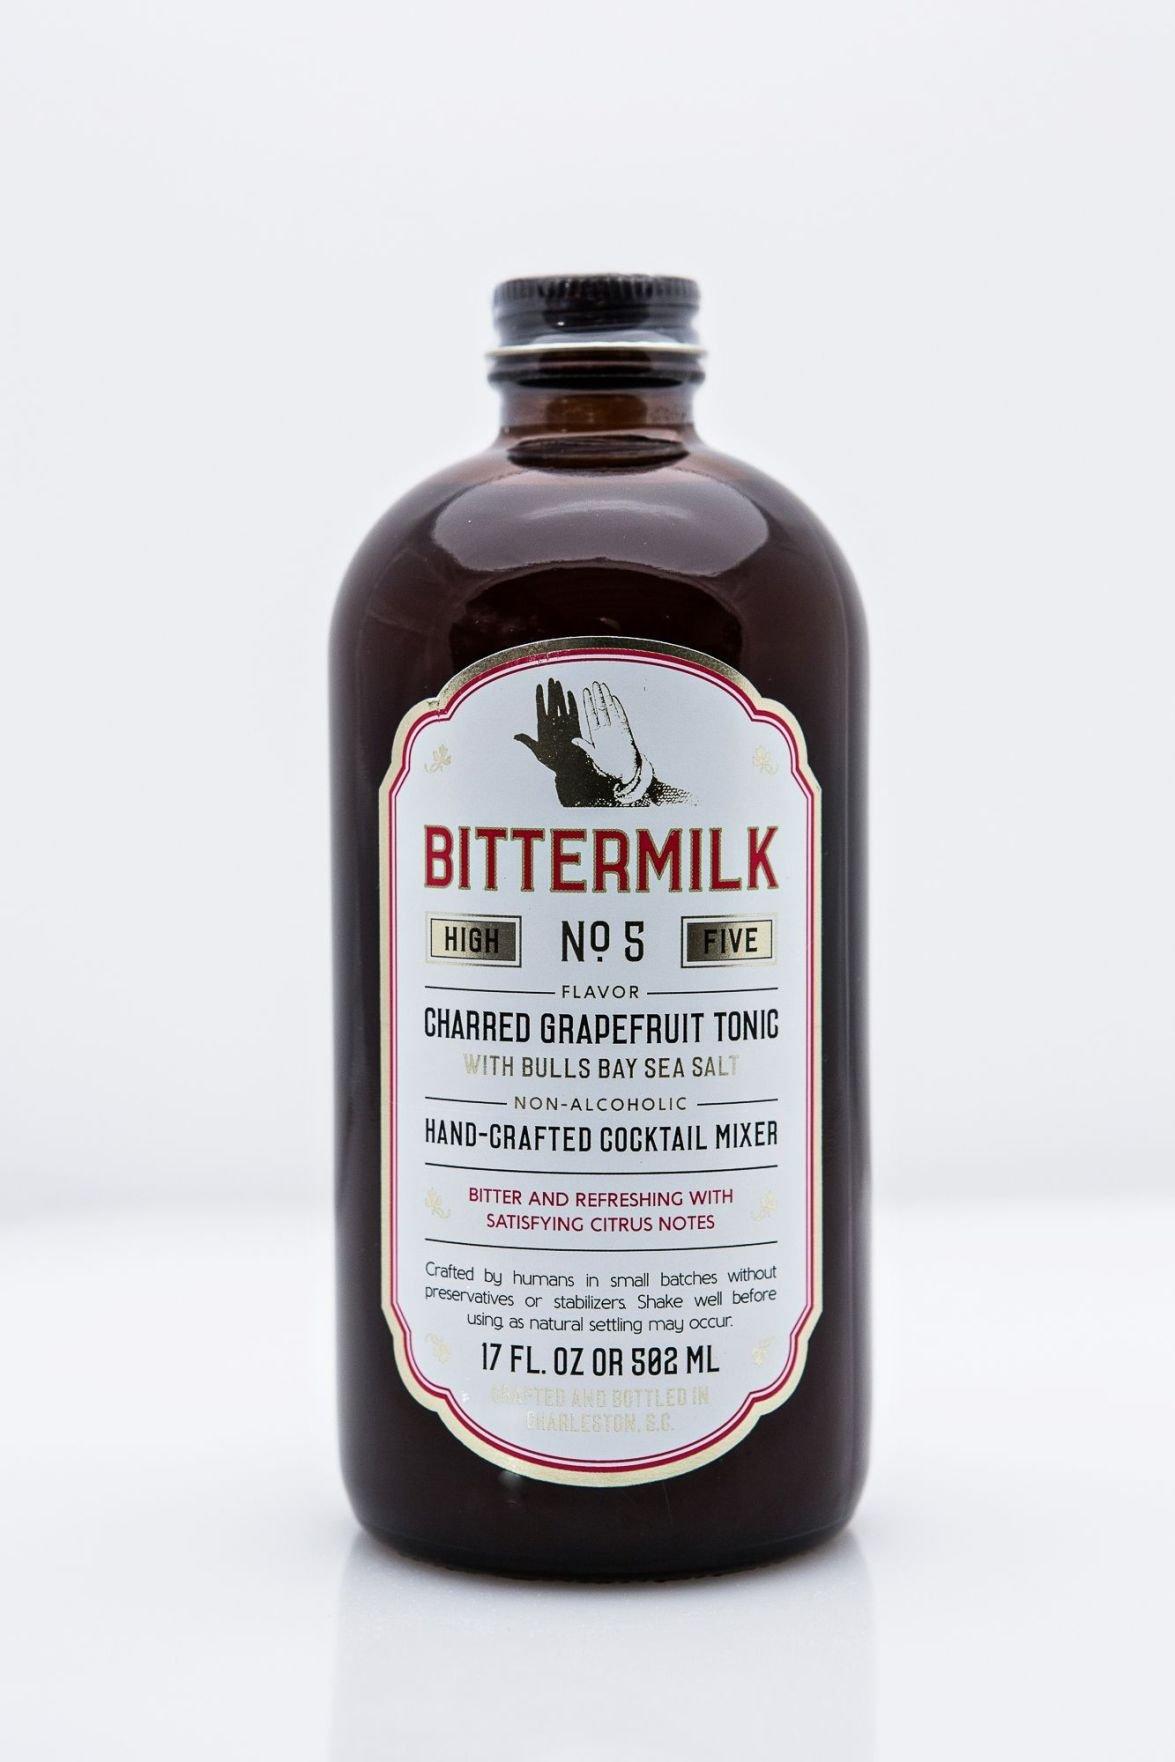 Bittermilk launches grapefruit tonic